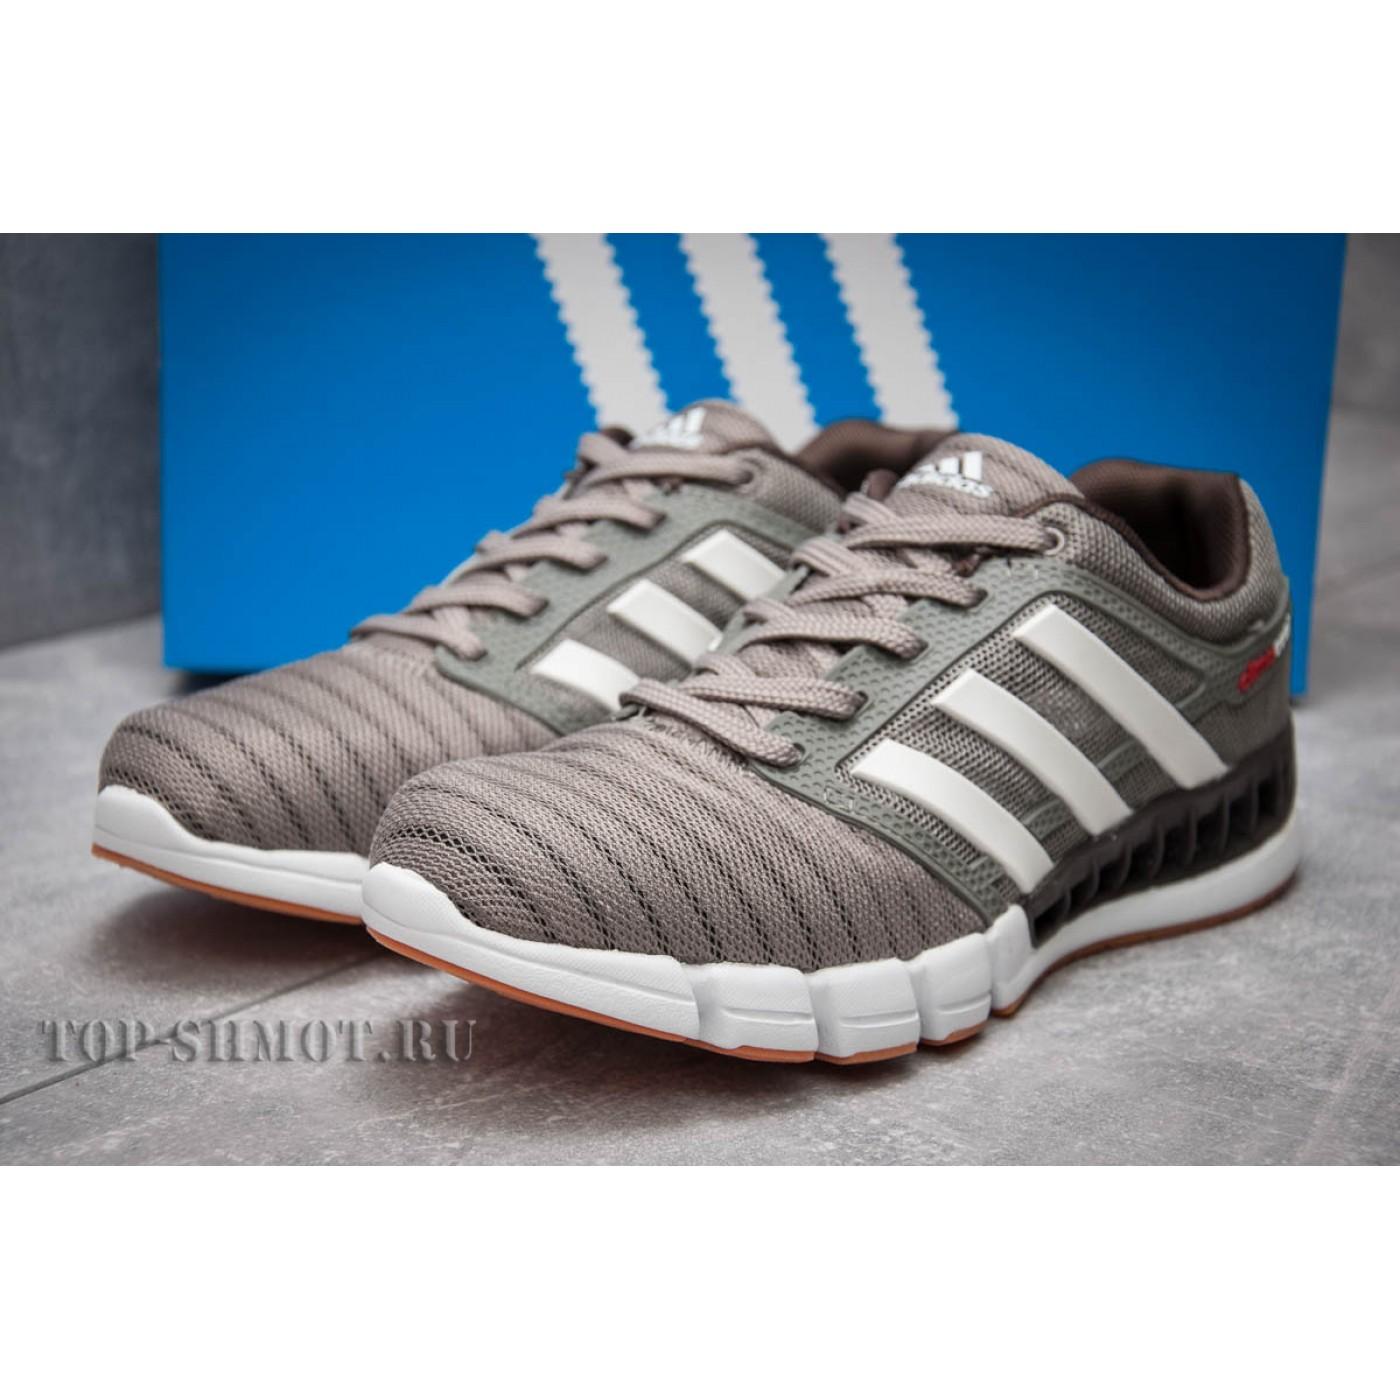 new zealand adidas climacool schuhe rot ecdfb 83f65